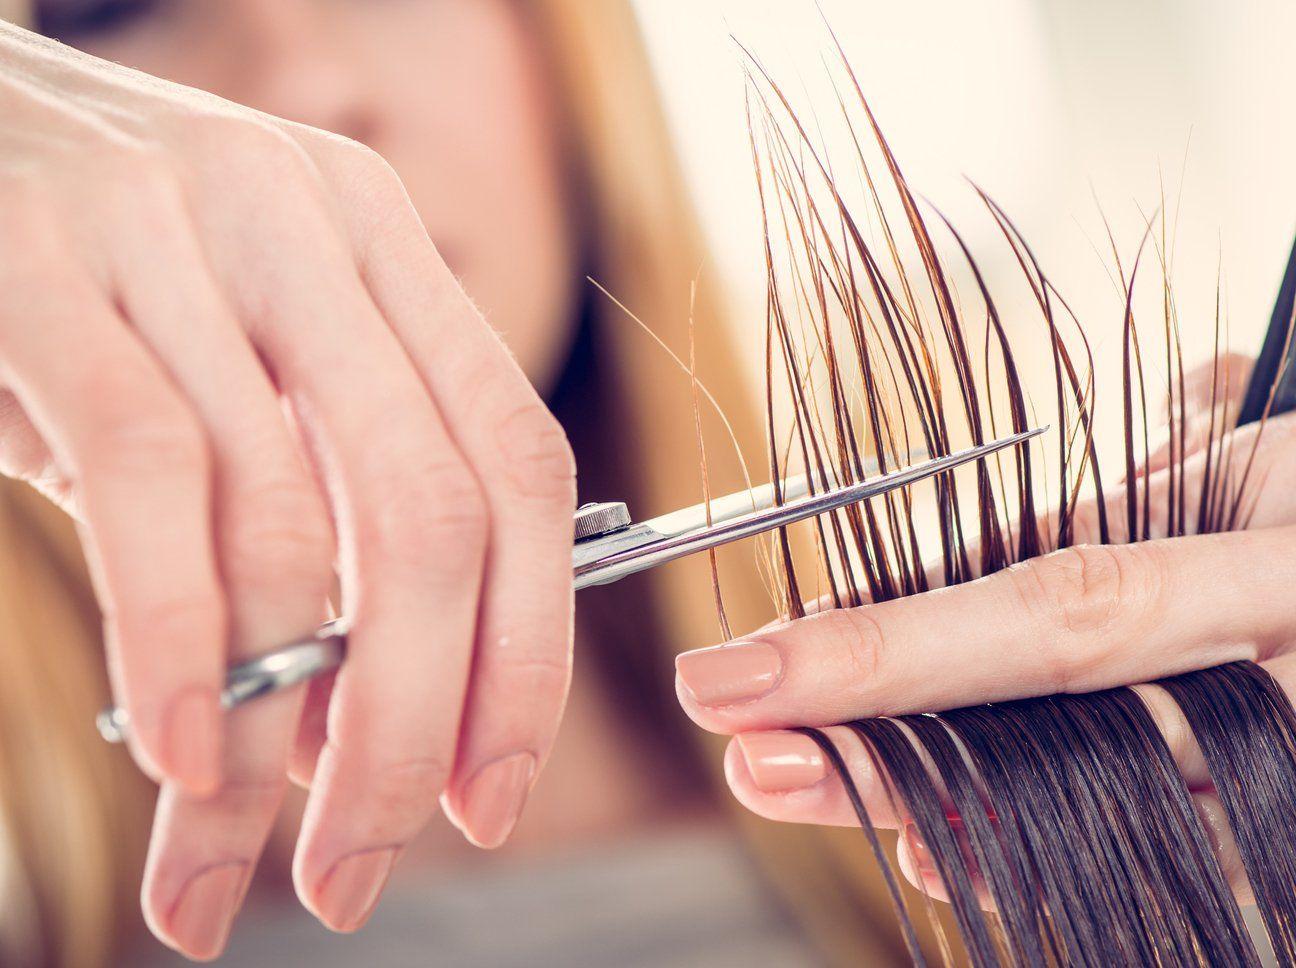 Haare selber schneiden: So gelingt die DIY-Frisur   Haare